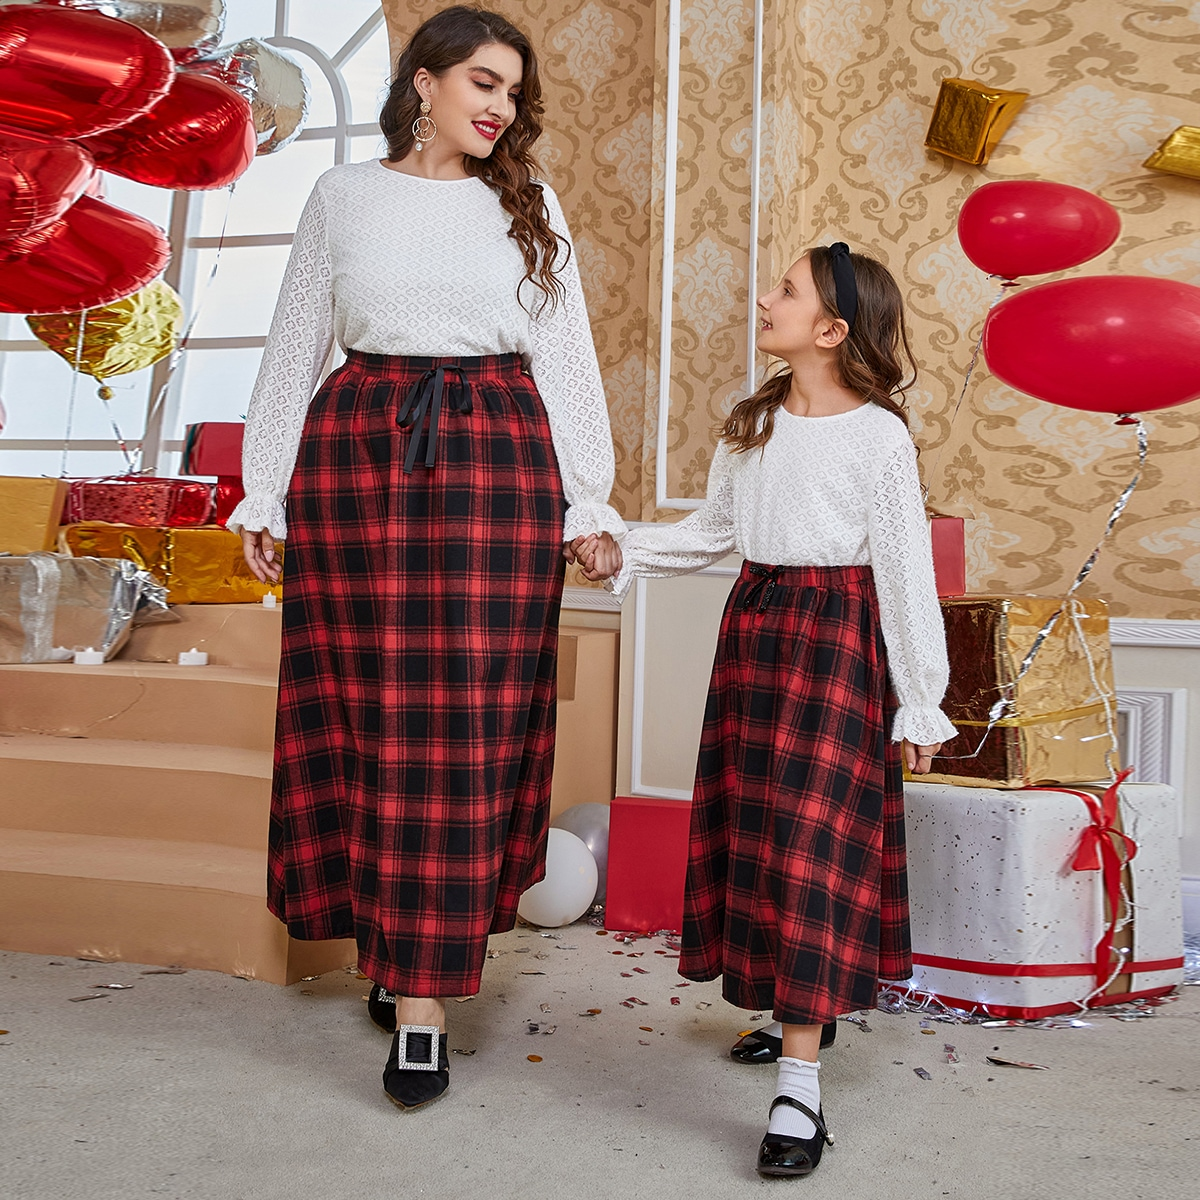 Plus 1pc Flounce Sleeve Lace Top & 1pc High Waist Plaid Knot Front Skirt